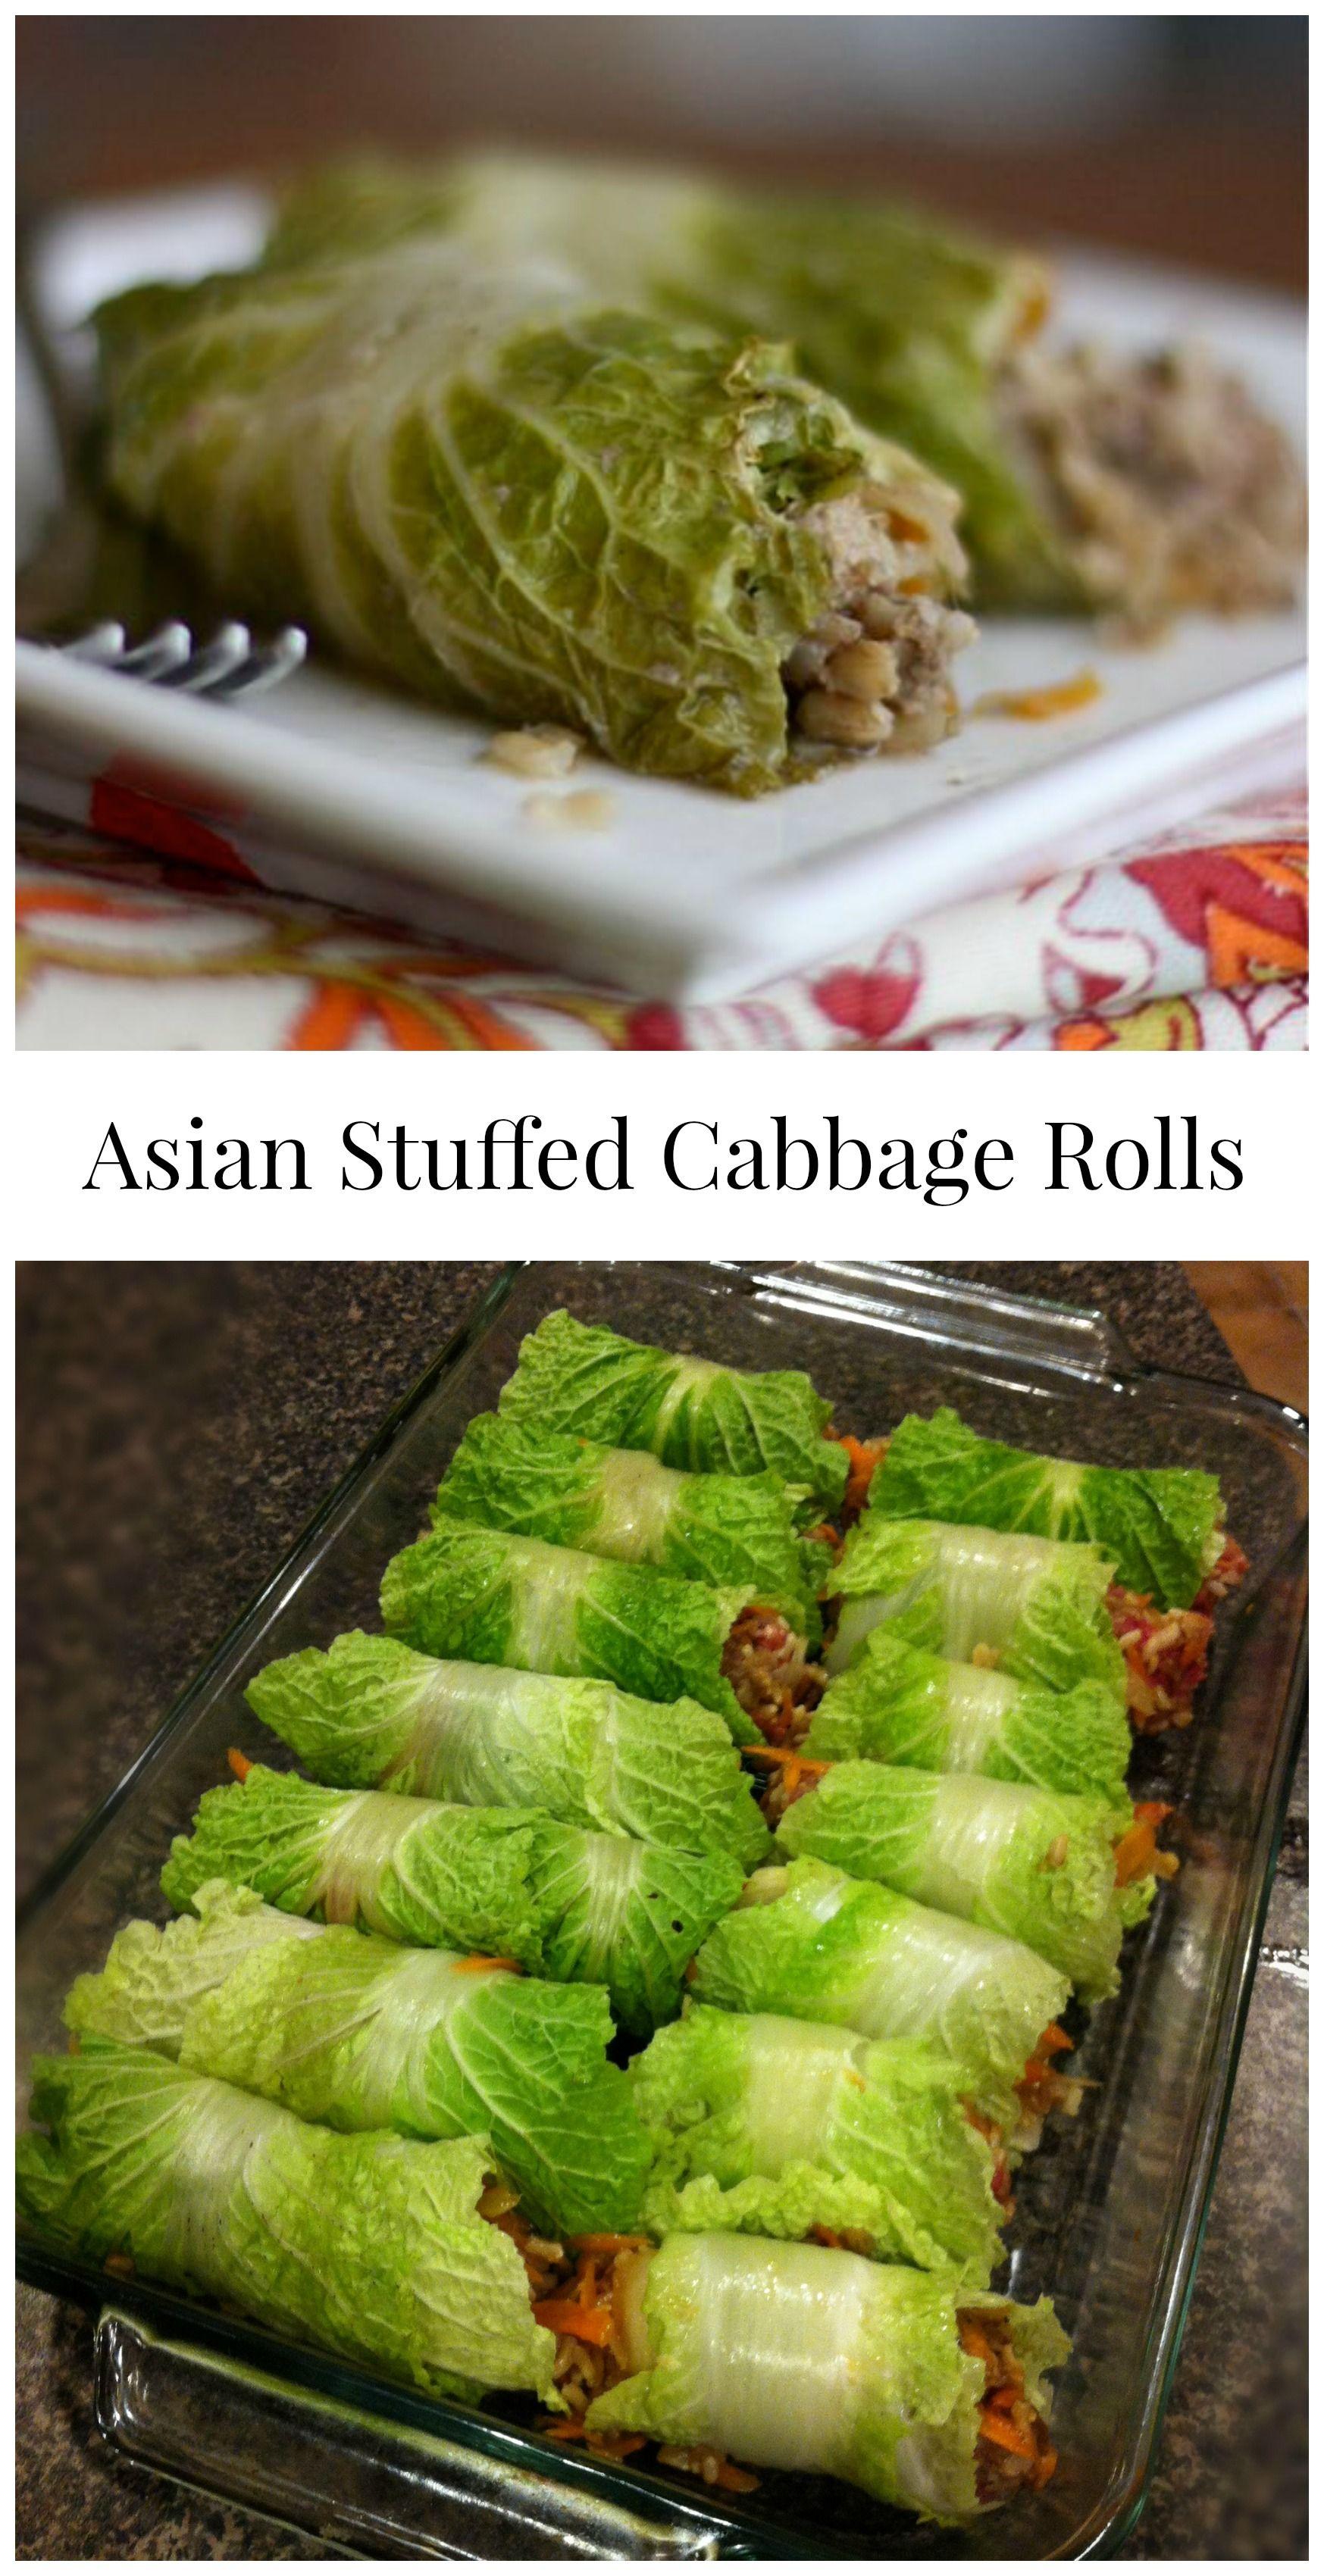 Asian stuffed napa cabbage rolls recipe food recipes